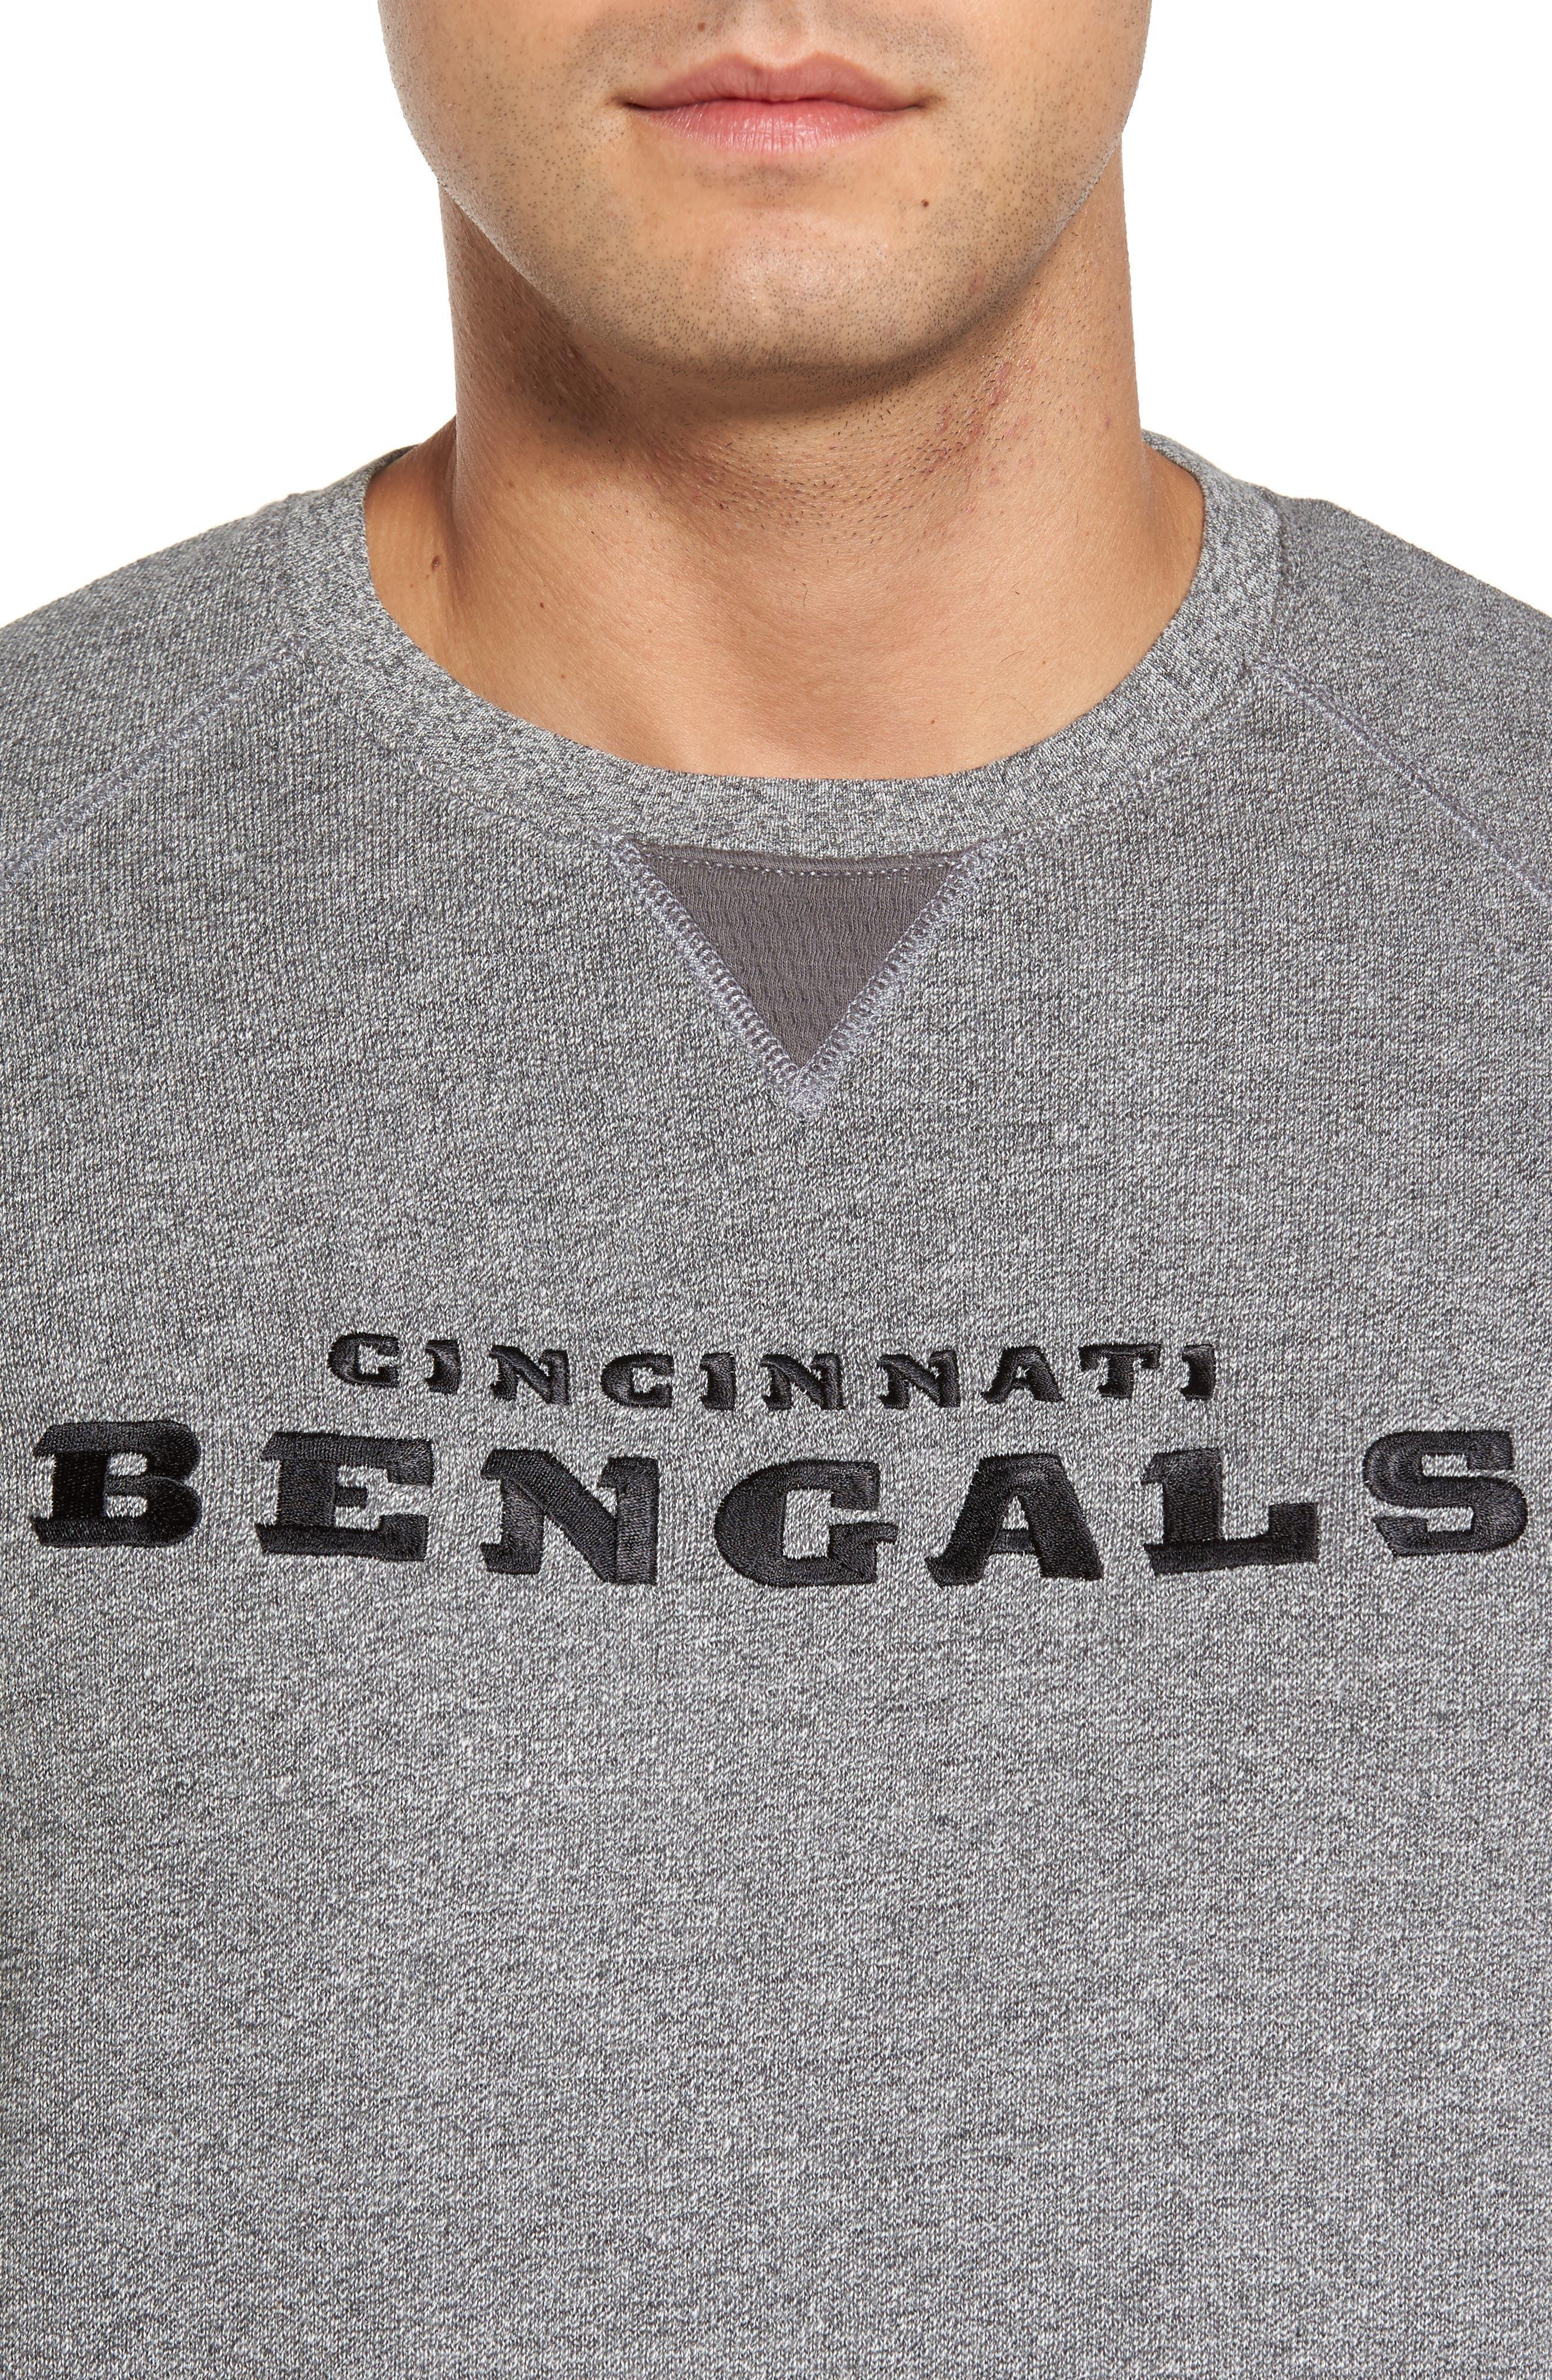 NFL Stitch of Liberty Embroidered Crewneck Sweatshirt,                             Alternate thumbnail 96, color,